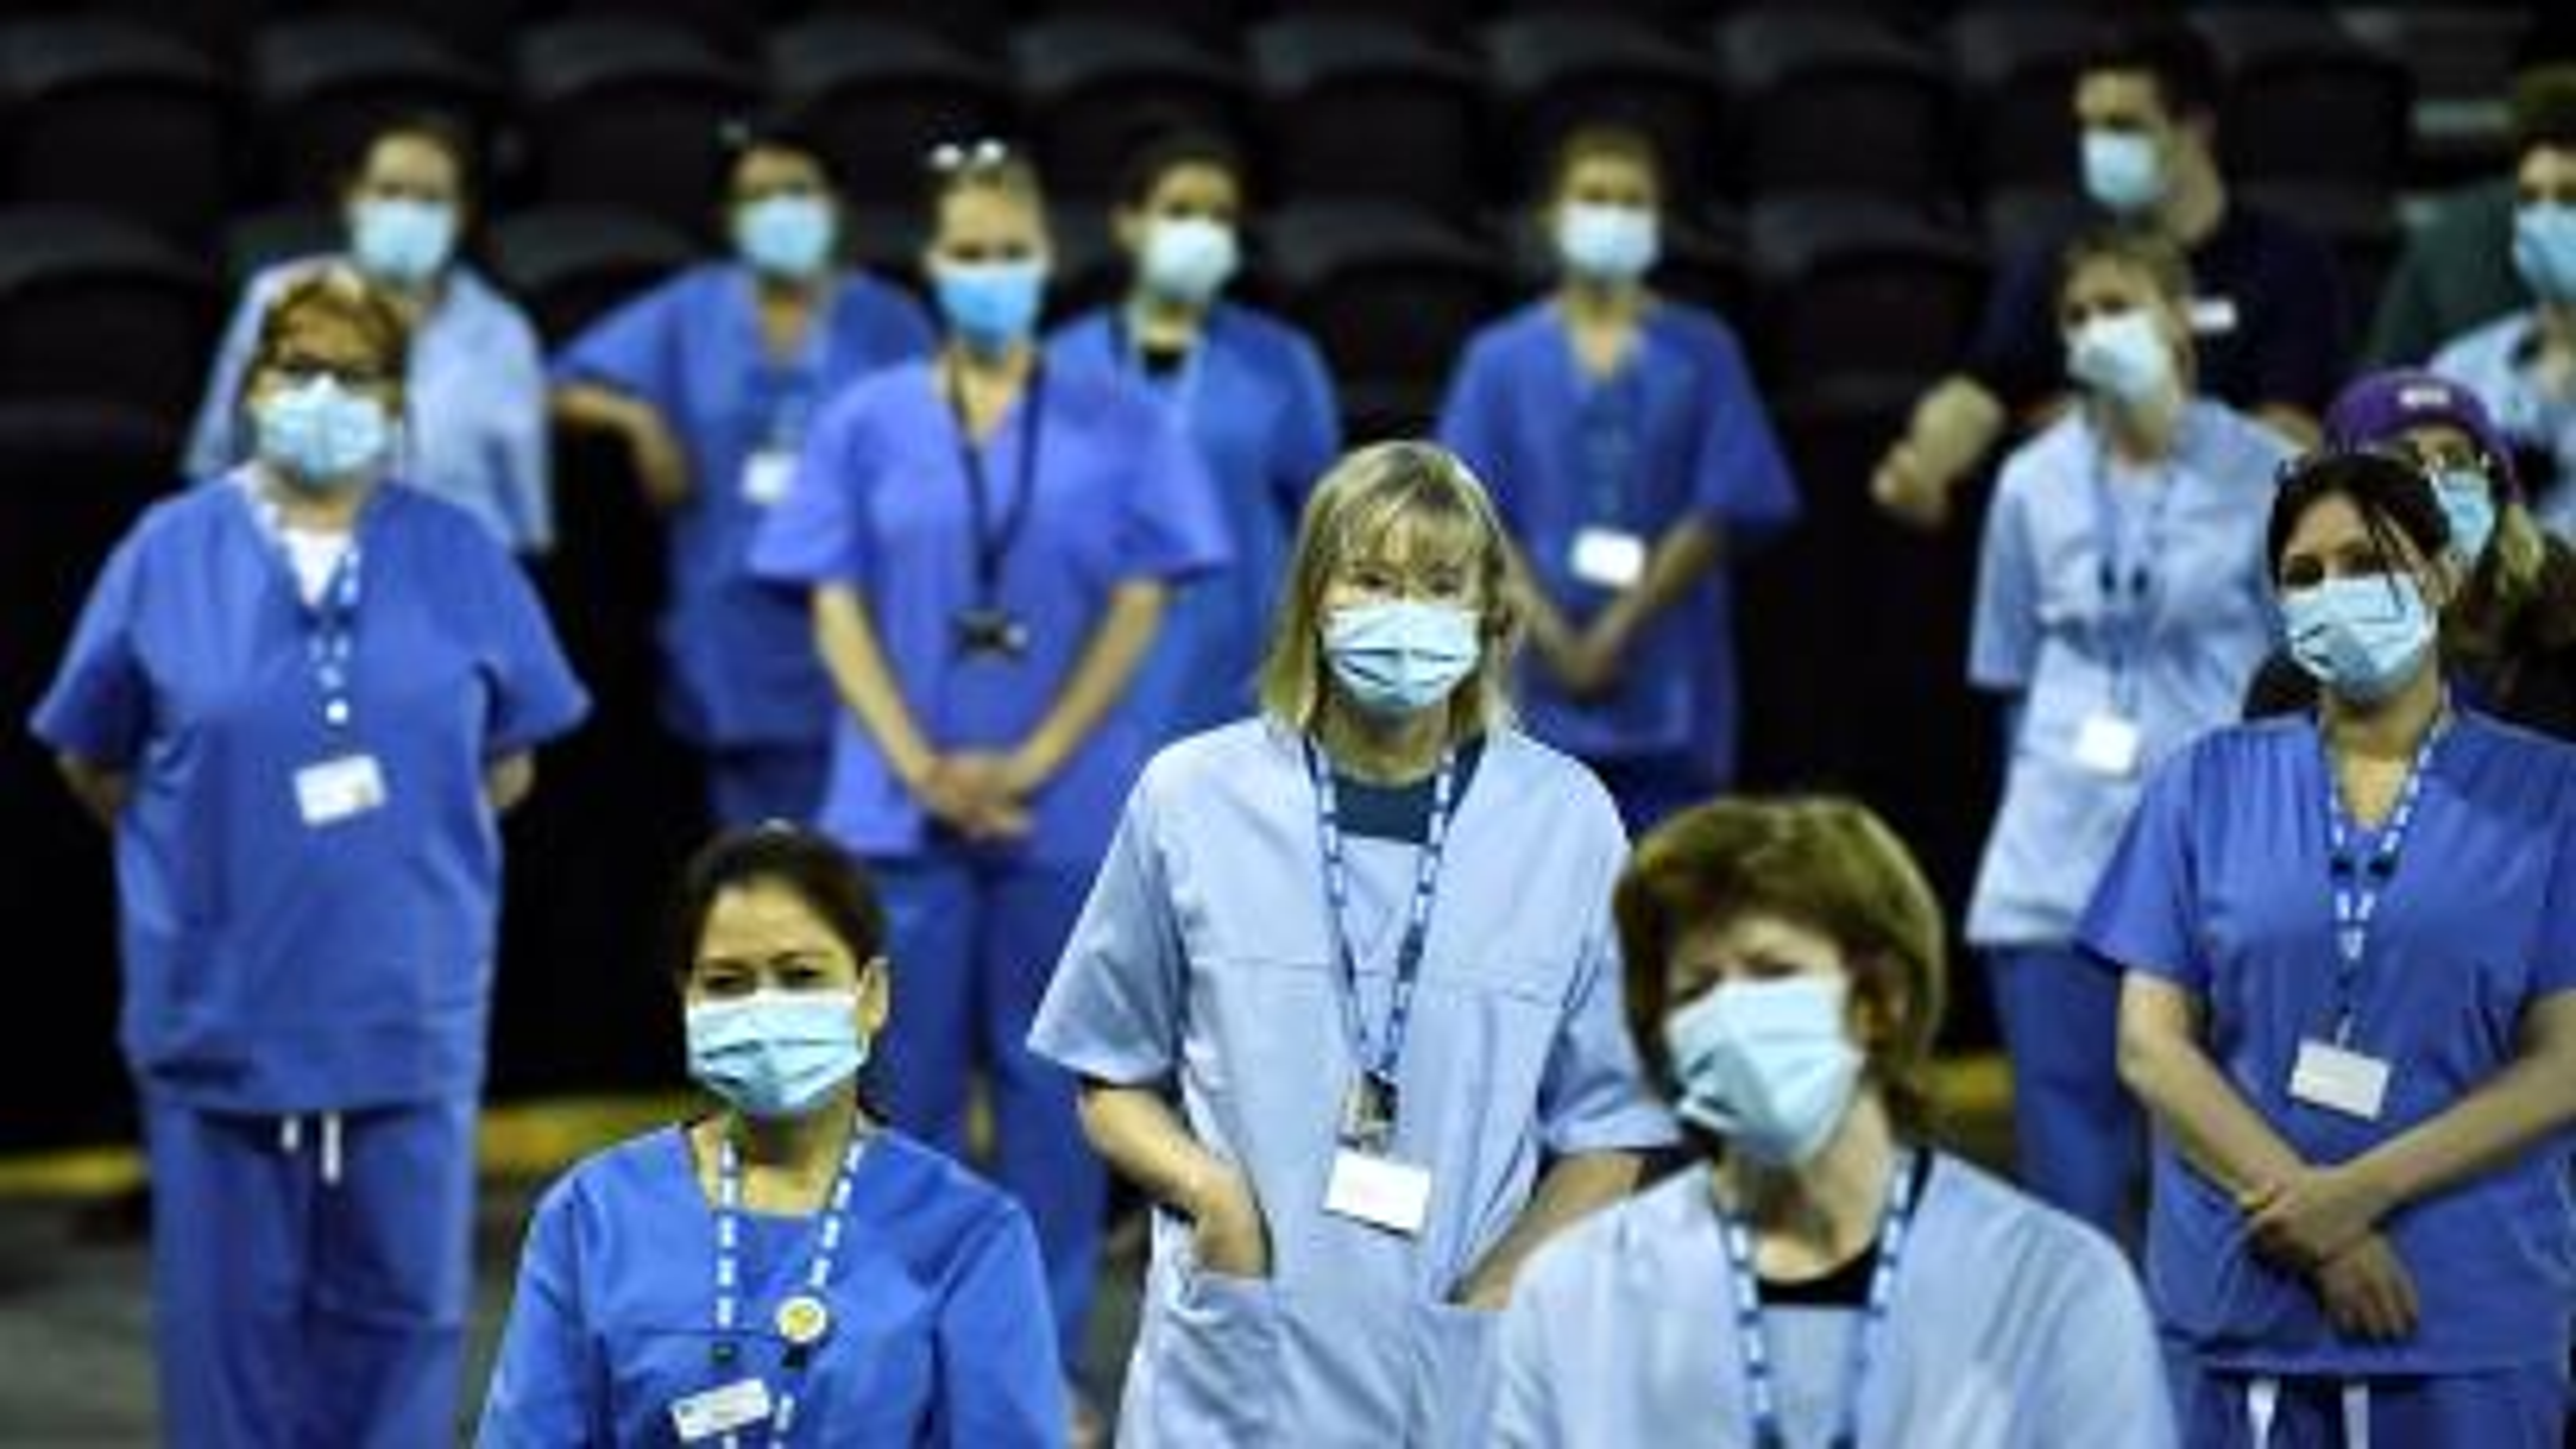 Medical staff discuss vaccines in Northern Ireland